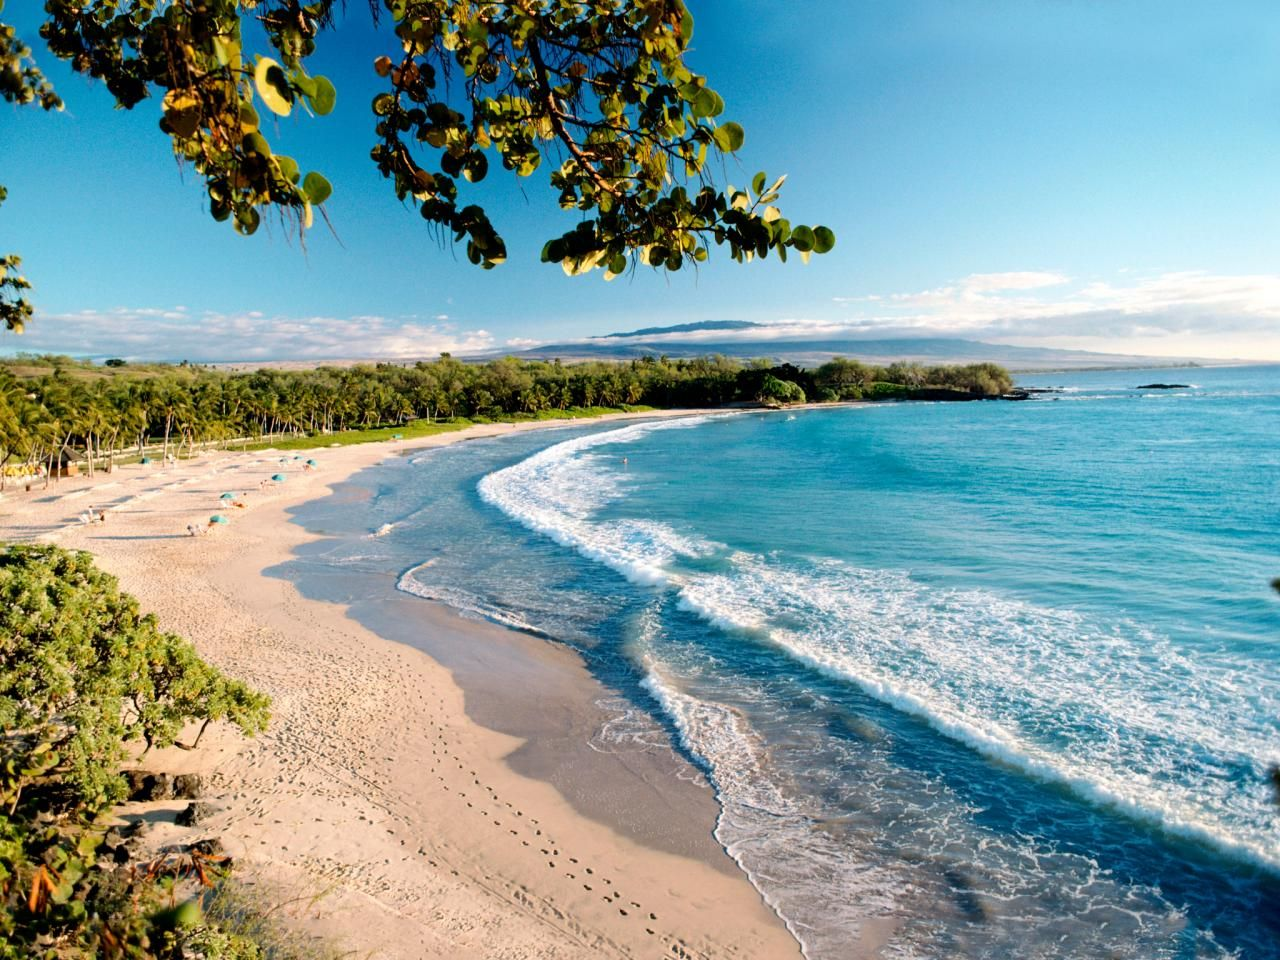 Kauna 'oa Beach, The Big Island : Top 10 Hawaiian Beaches : TravelChannel.com